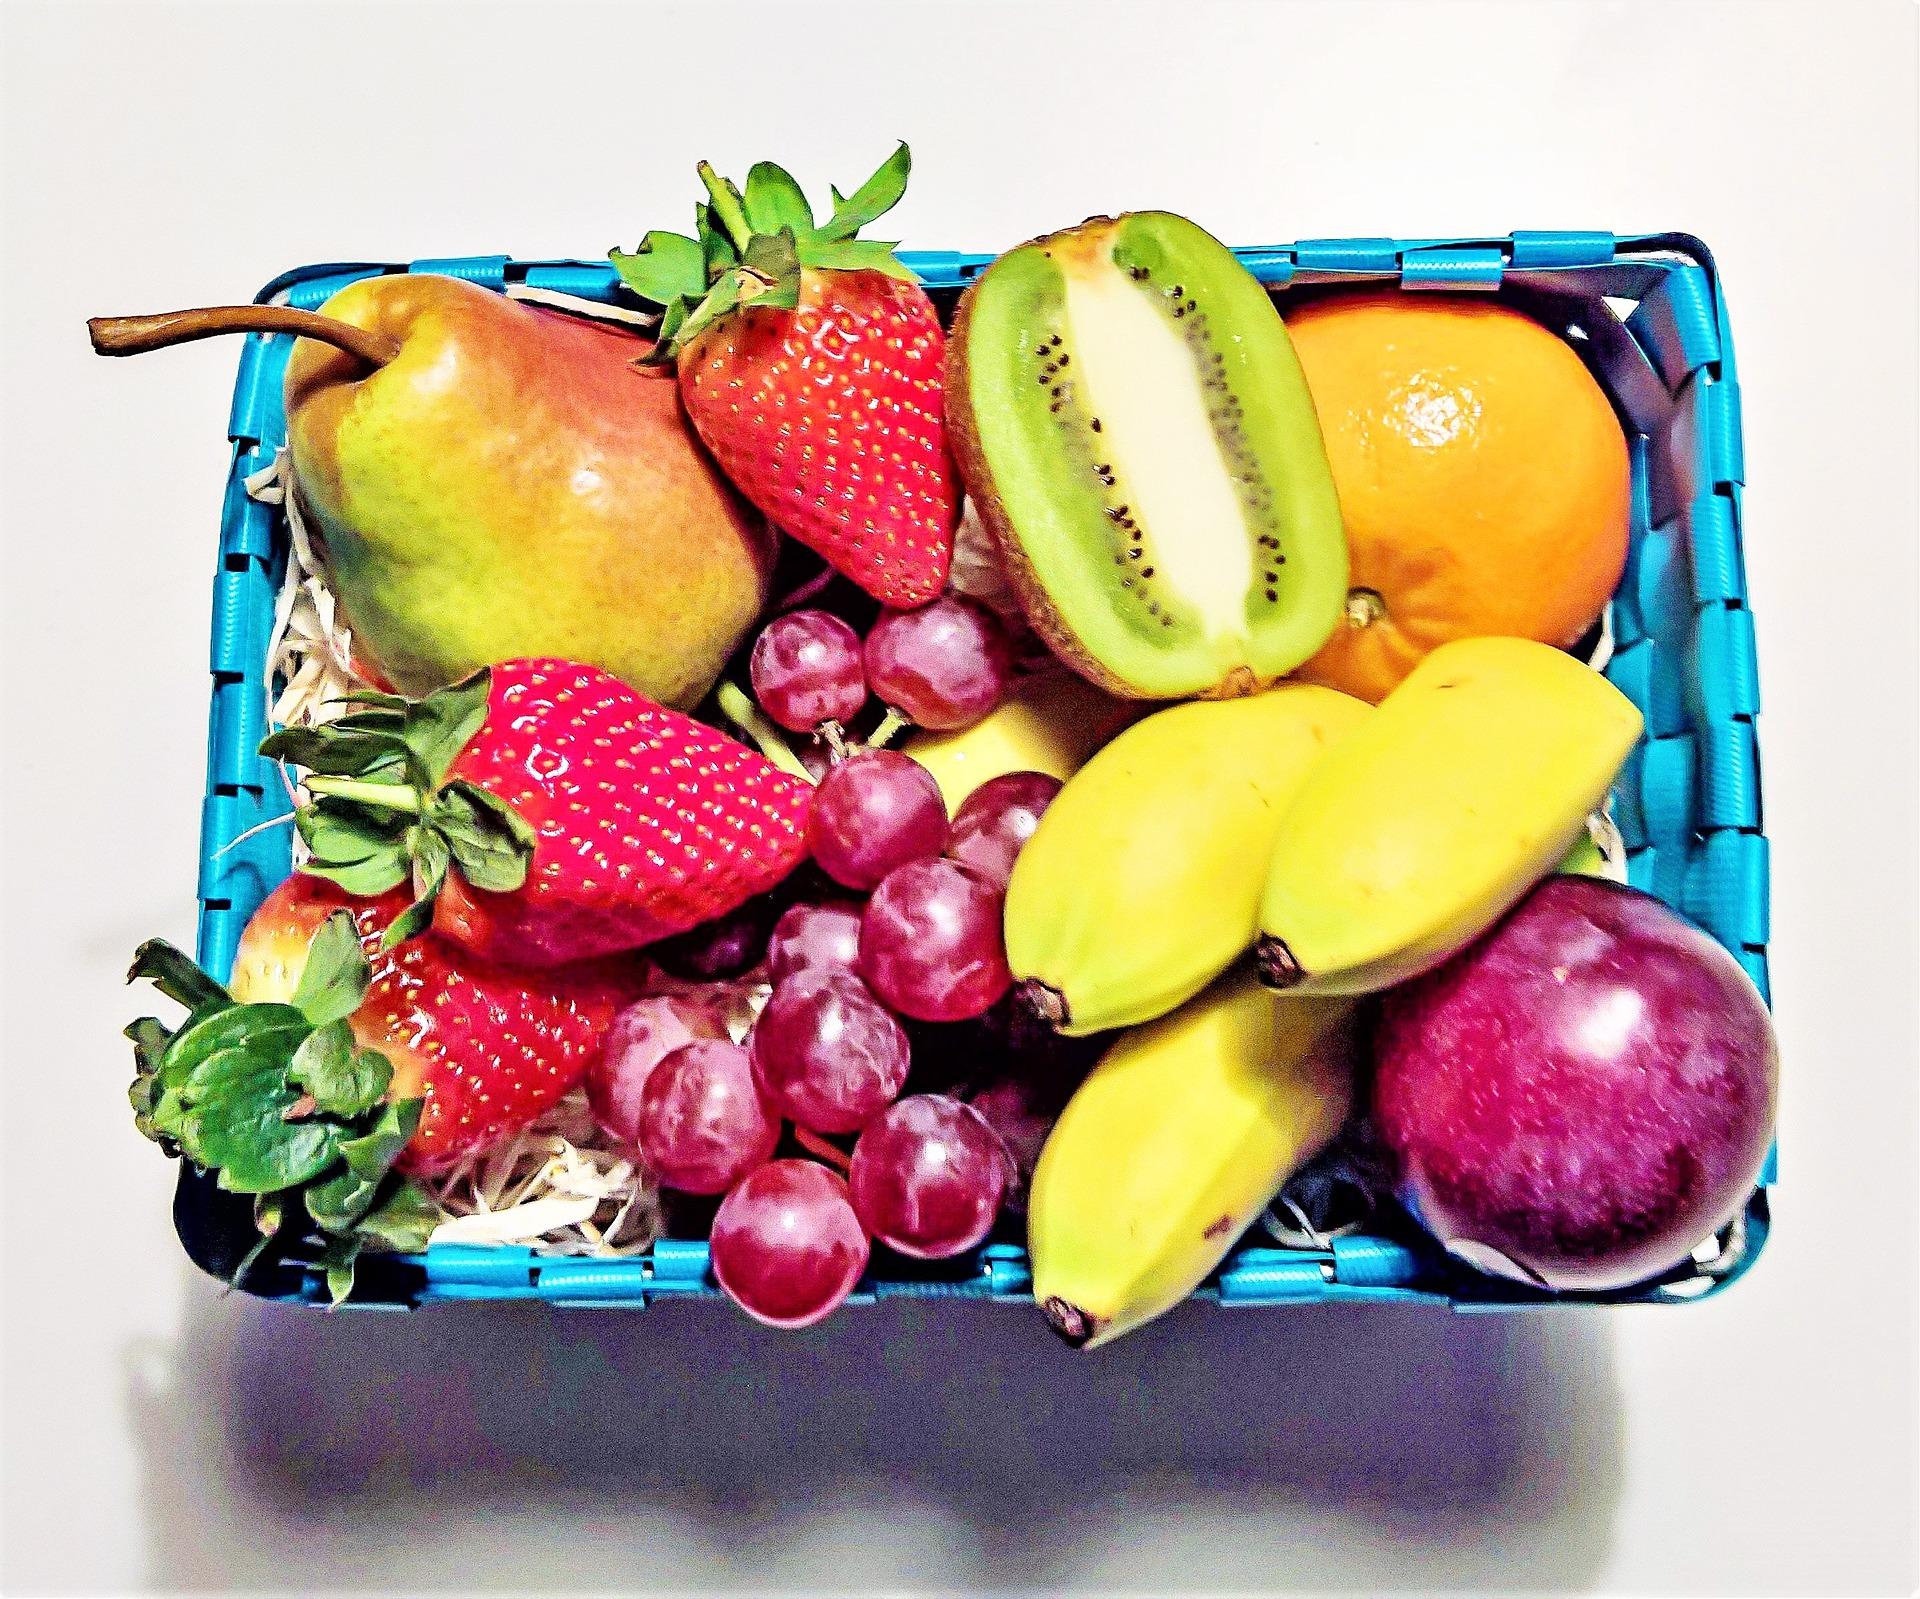 fruit-basket-2132400_1920